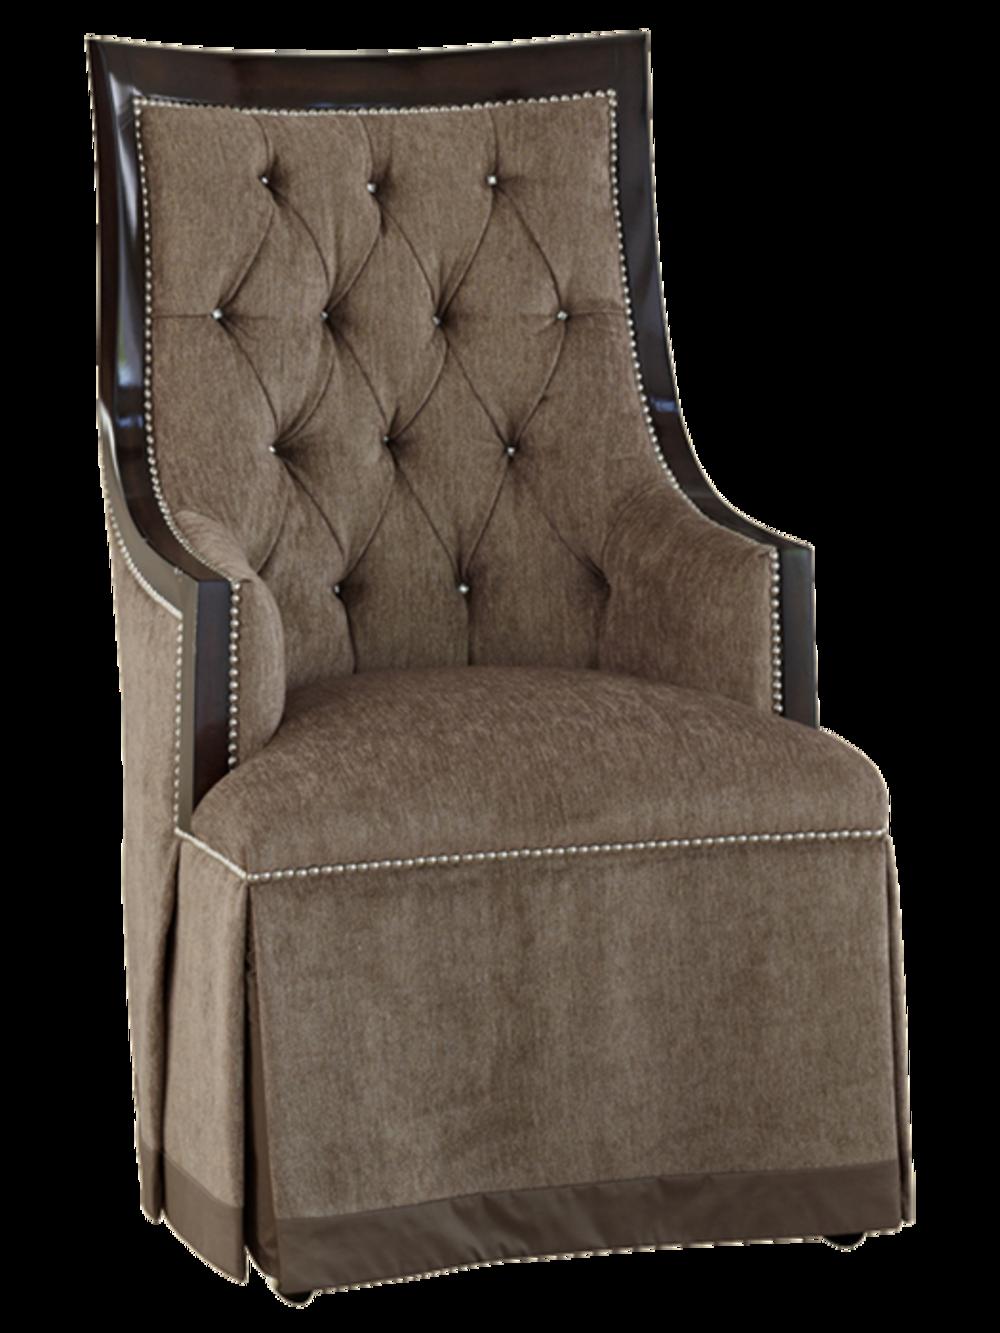 Marge Carson - Jolie Arm Chair